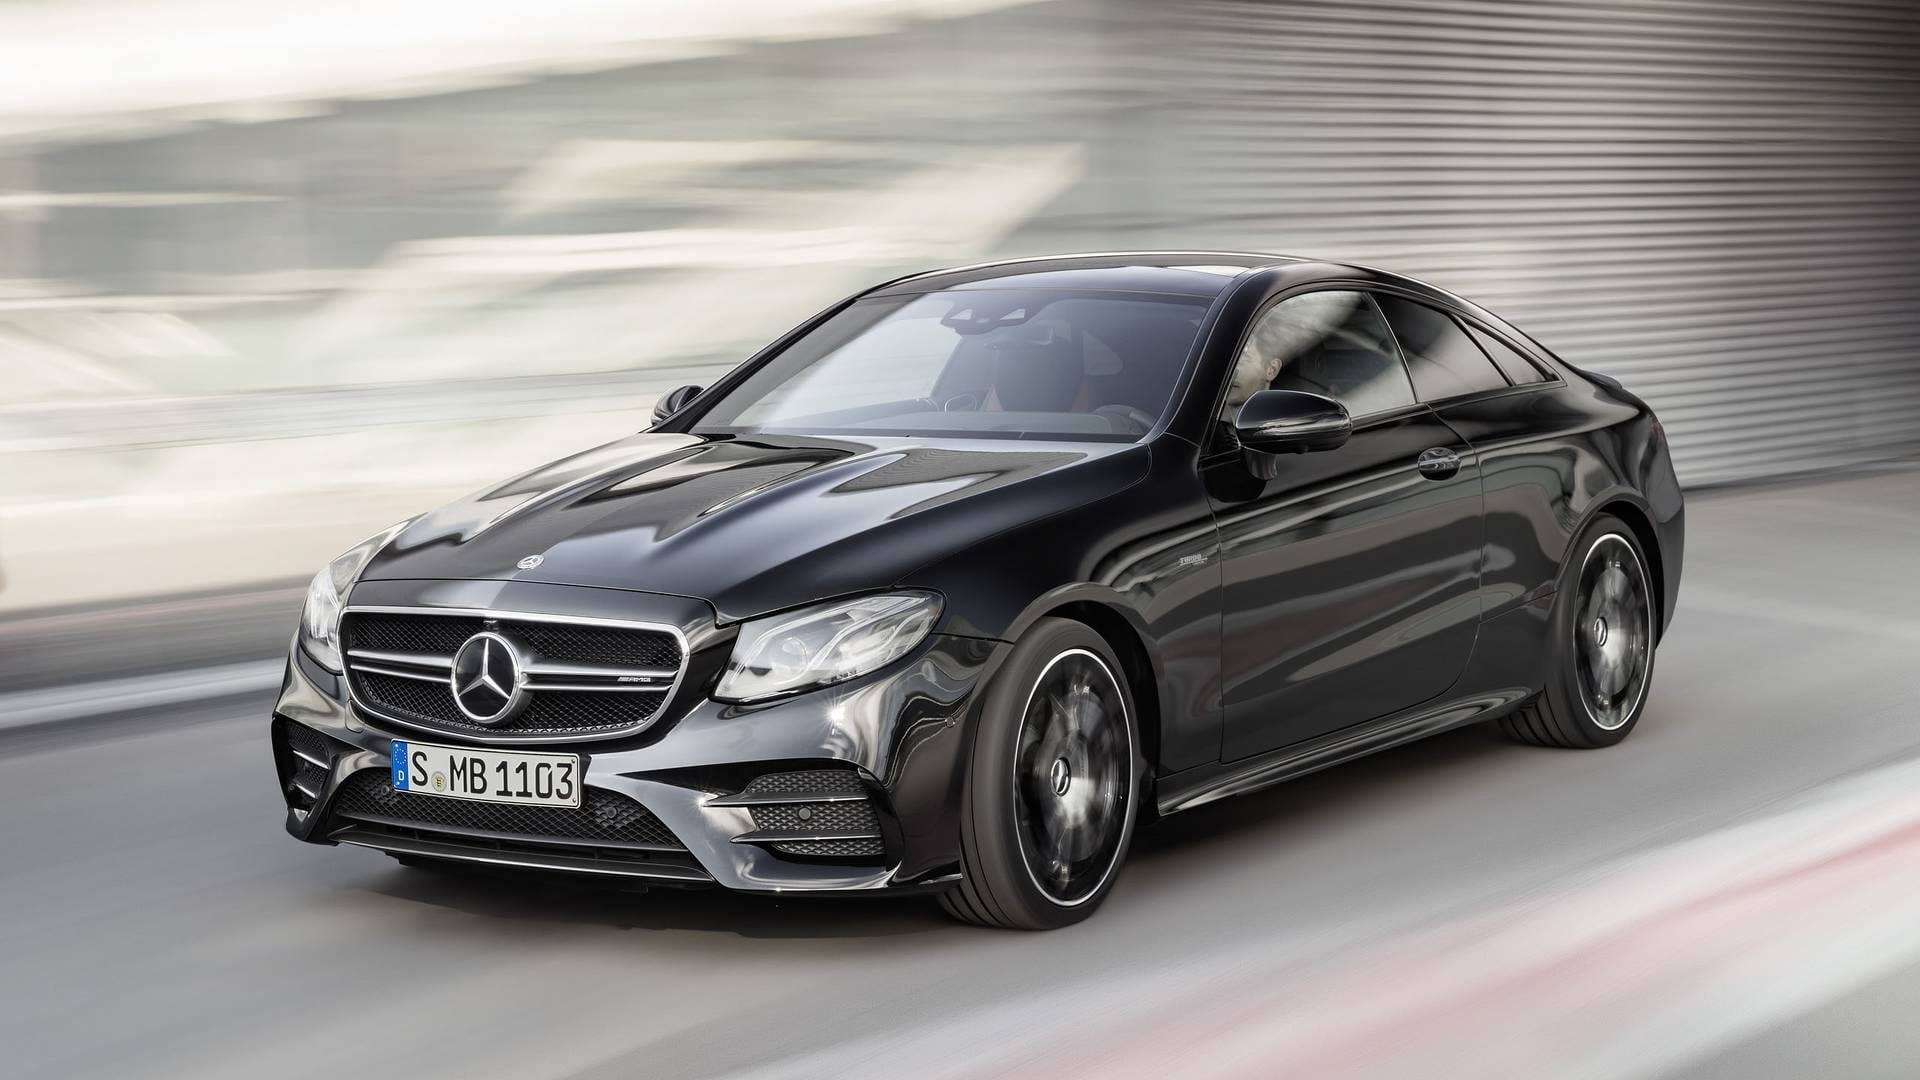 Mercedes-AMG E 53 4Matic+ Coupe